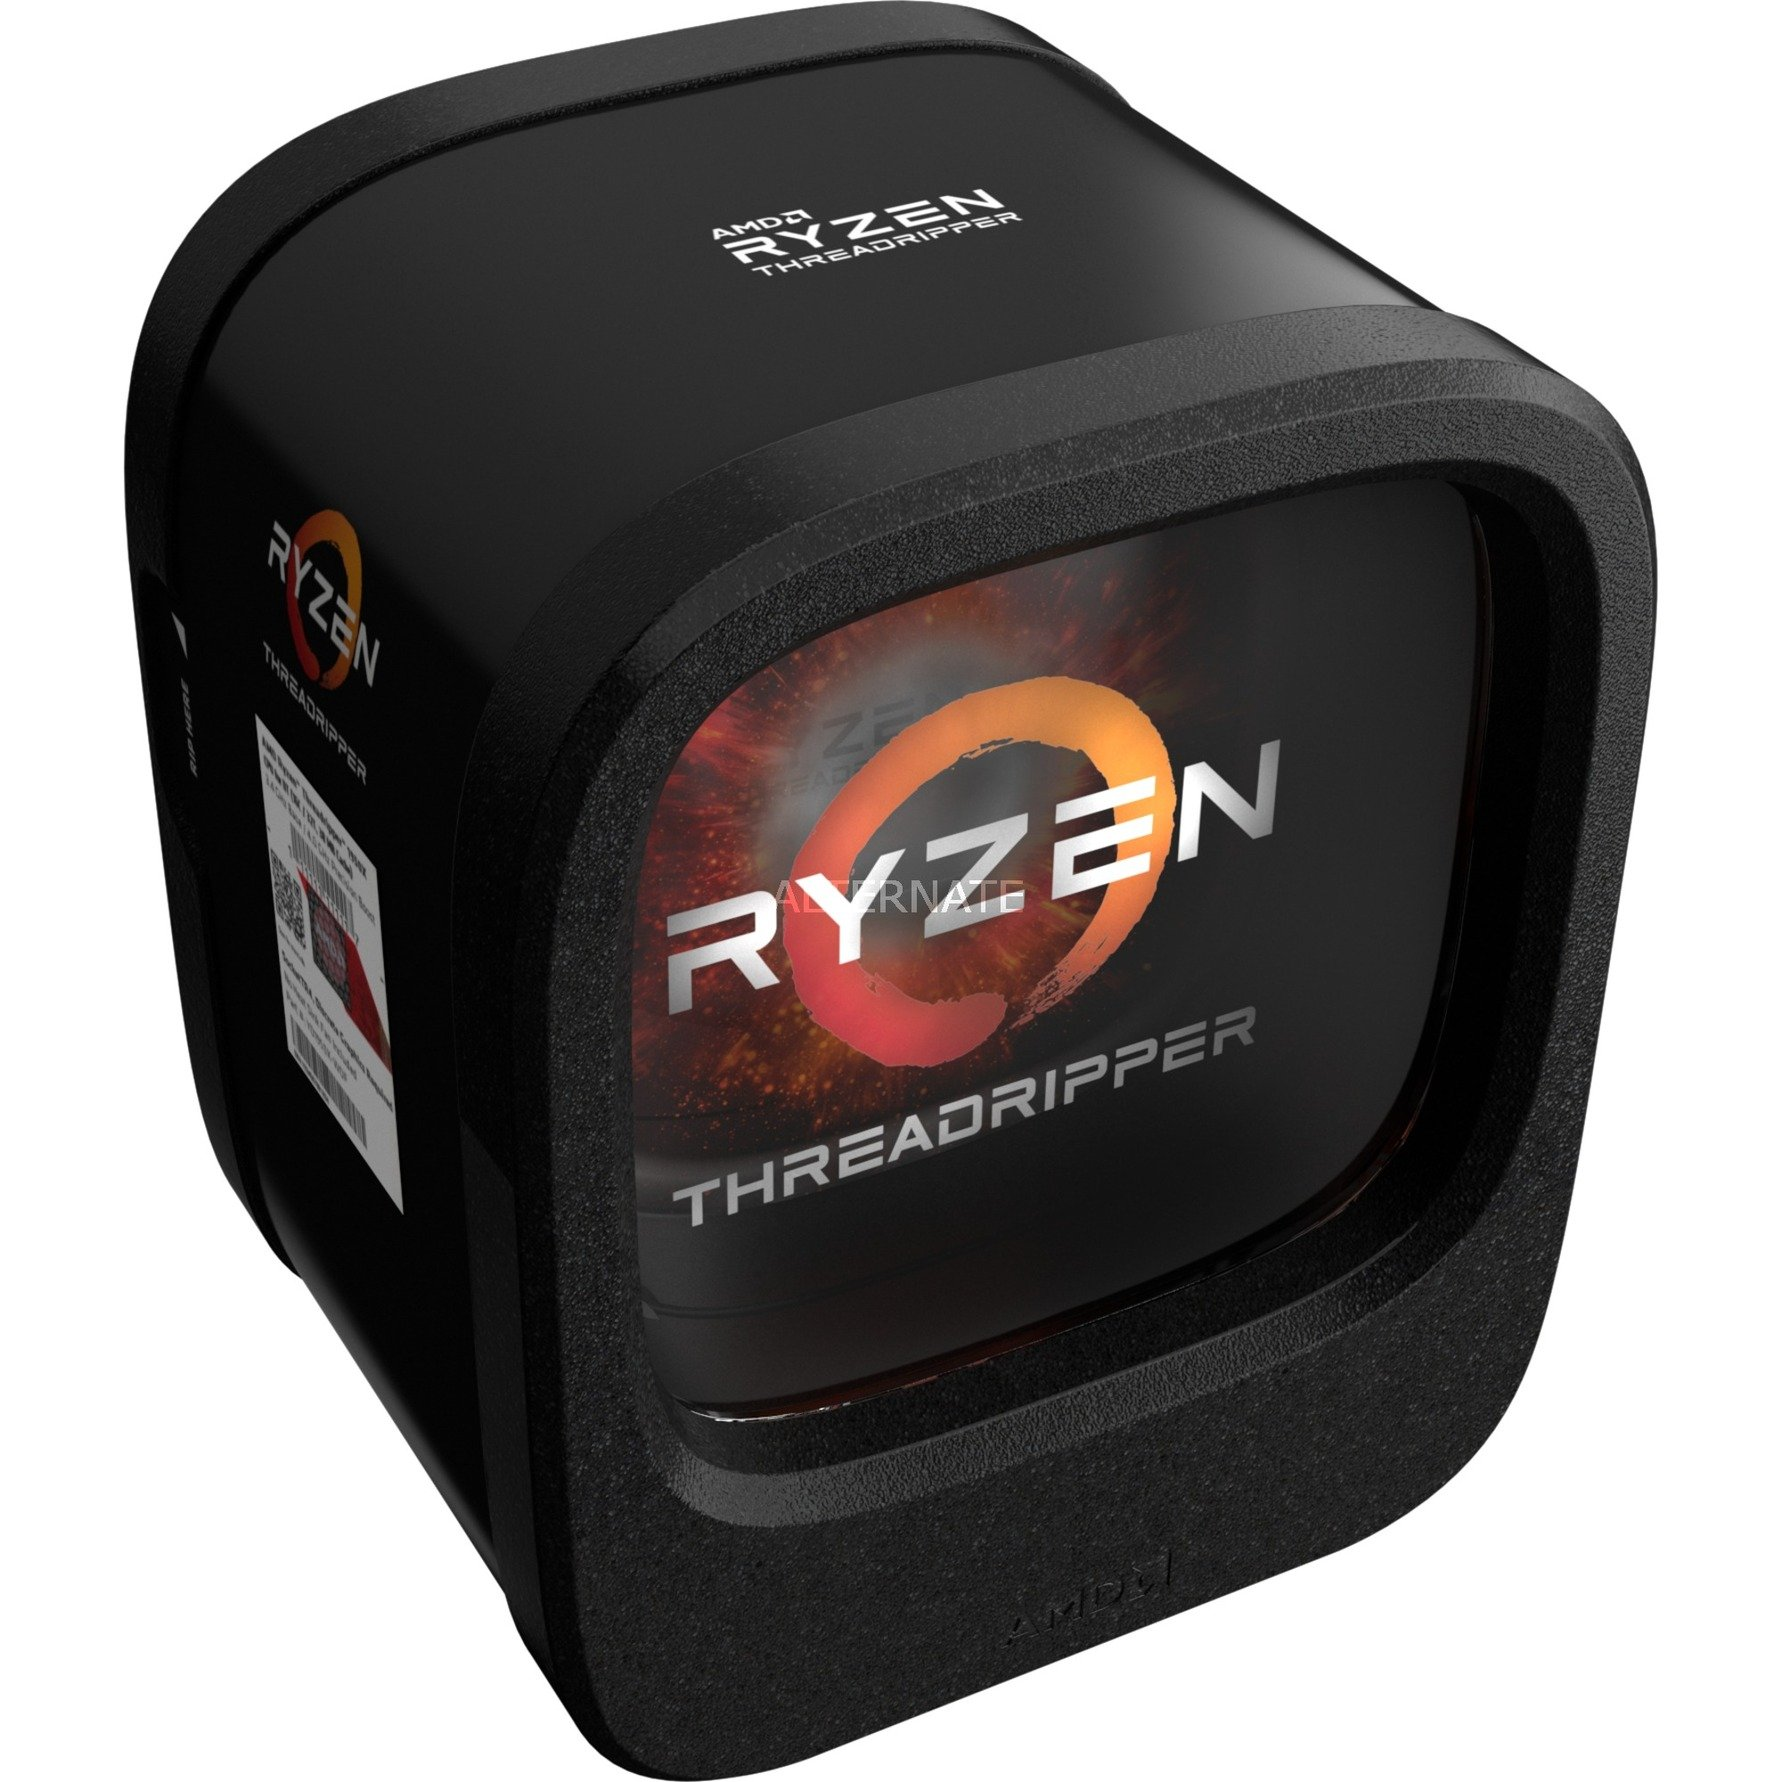 Ryzen Threadripper 1900X procesador 3,8 GHz Caja 16 MB L3